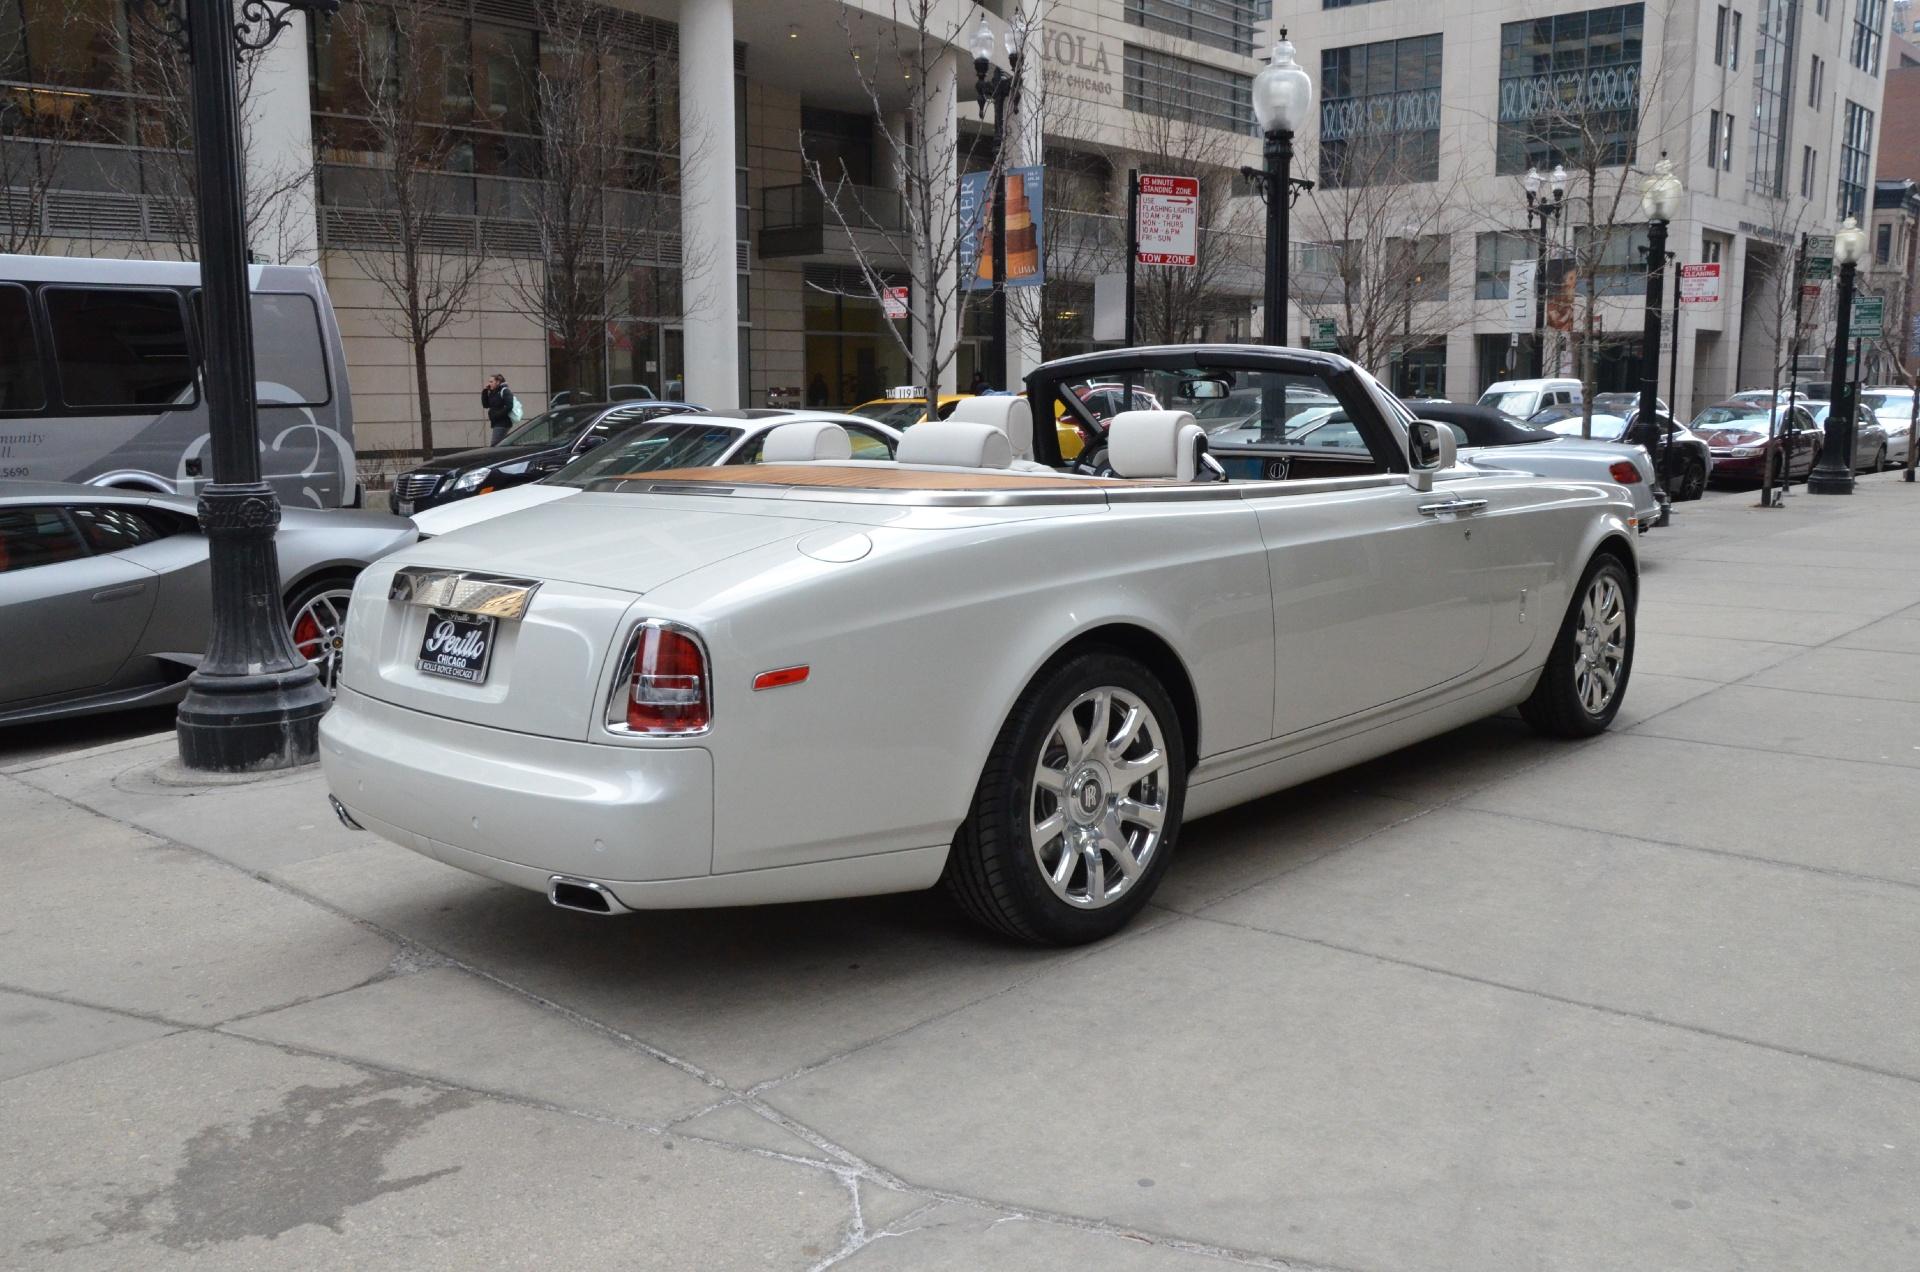 2015 rolls royce phantom drophead coupe stock r249a for - Rolls royce phantom drophead coupe for sale ...